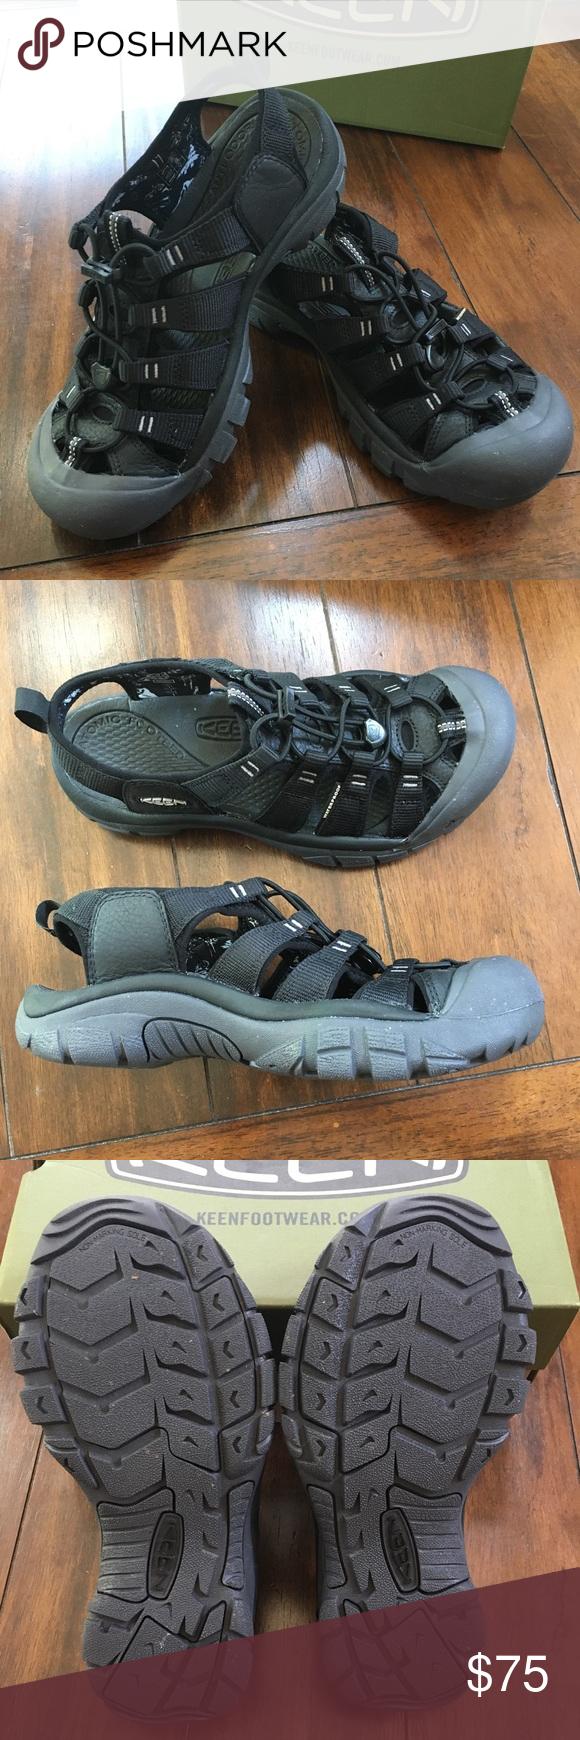 ec60ca7545e3 Keen Women s Black Newport Eco Sandals Gently used